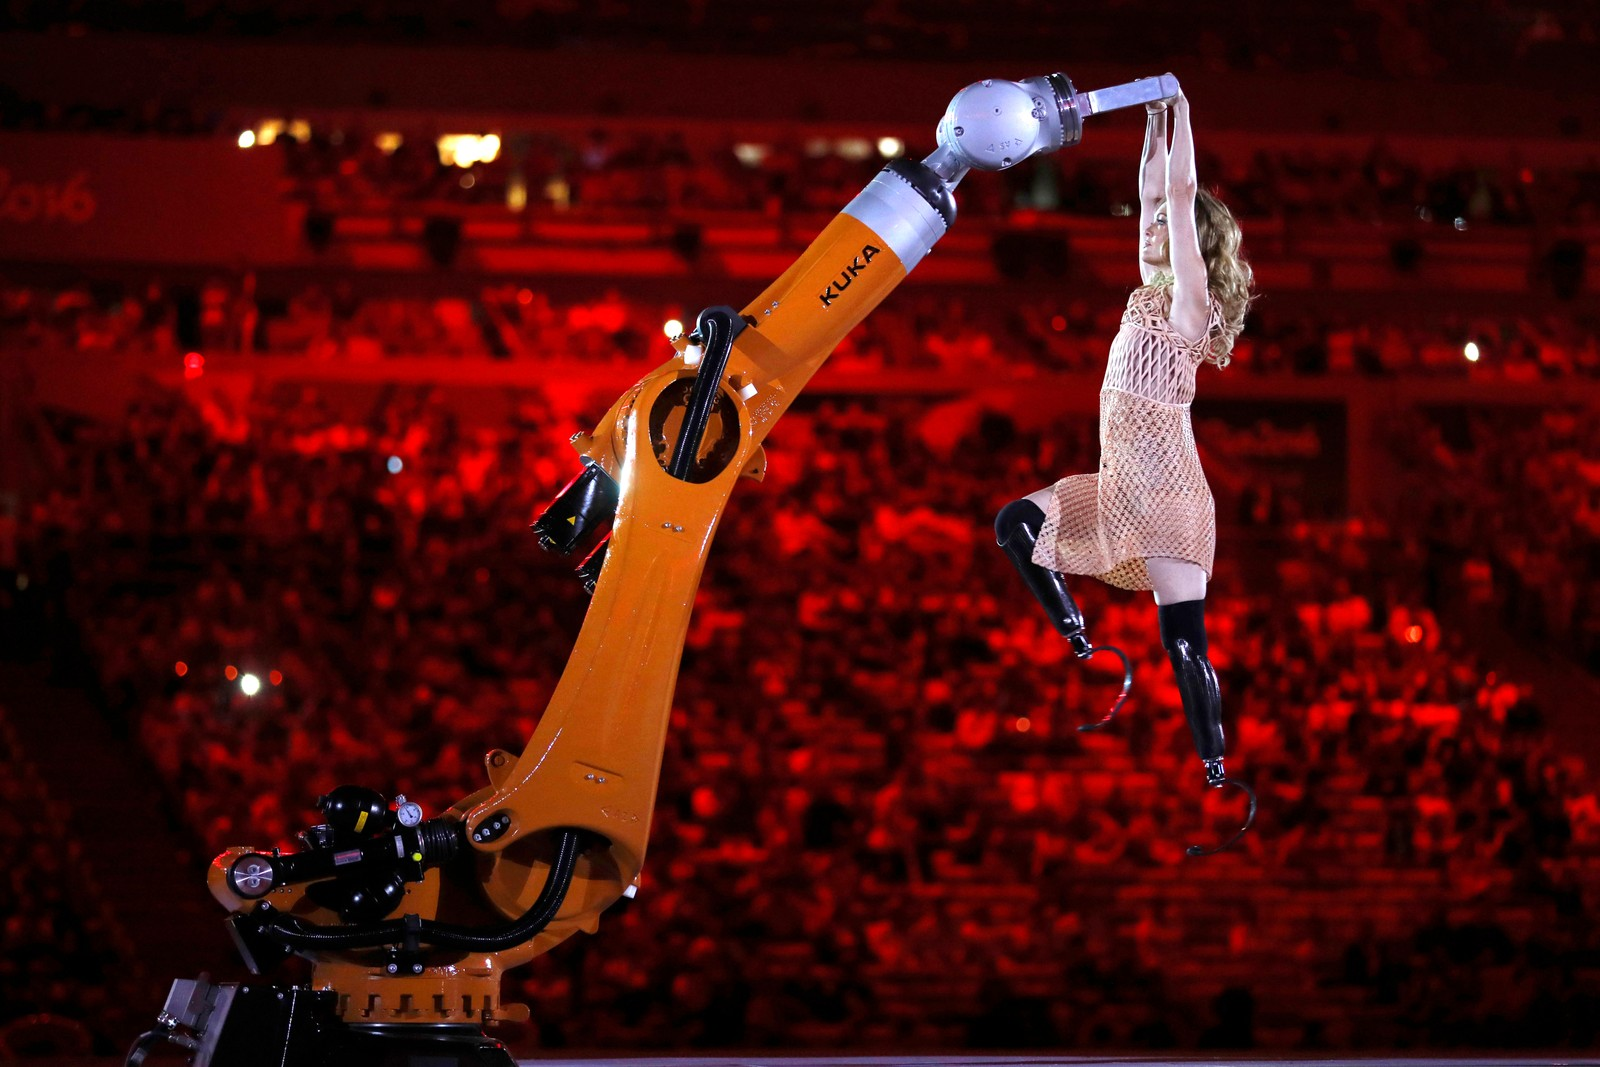 Amy Purdy danser med en robot under åpningsseremonien av Paralympics i Rio i Brasil den 7. september.